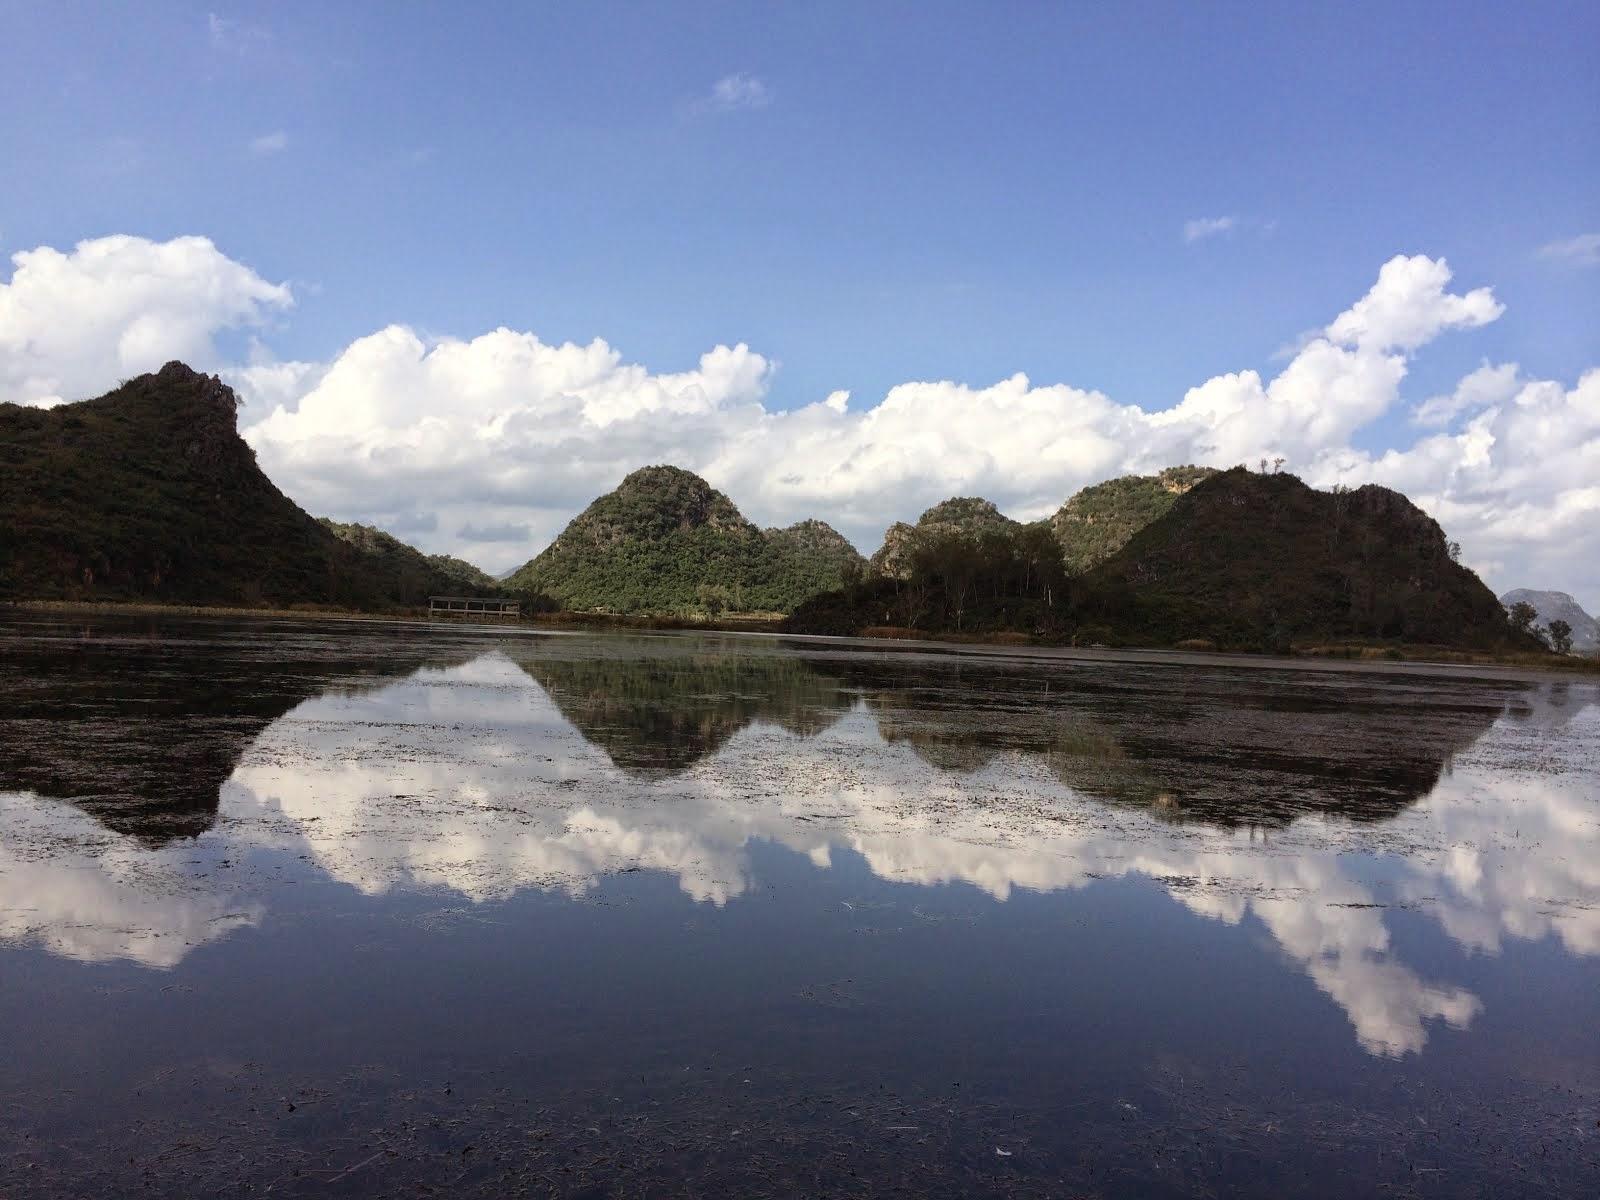 Puzhehai, Qiubei, Yunnan, China